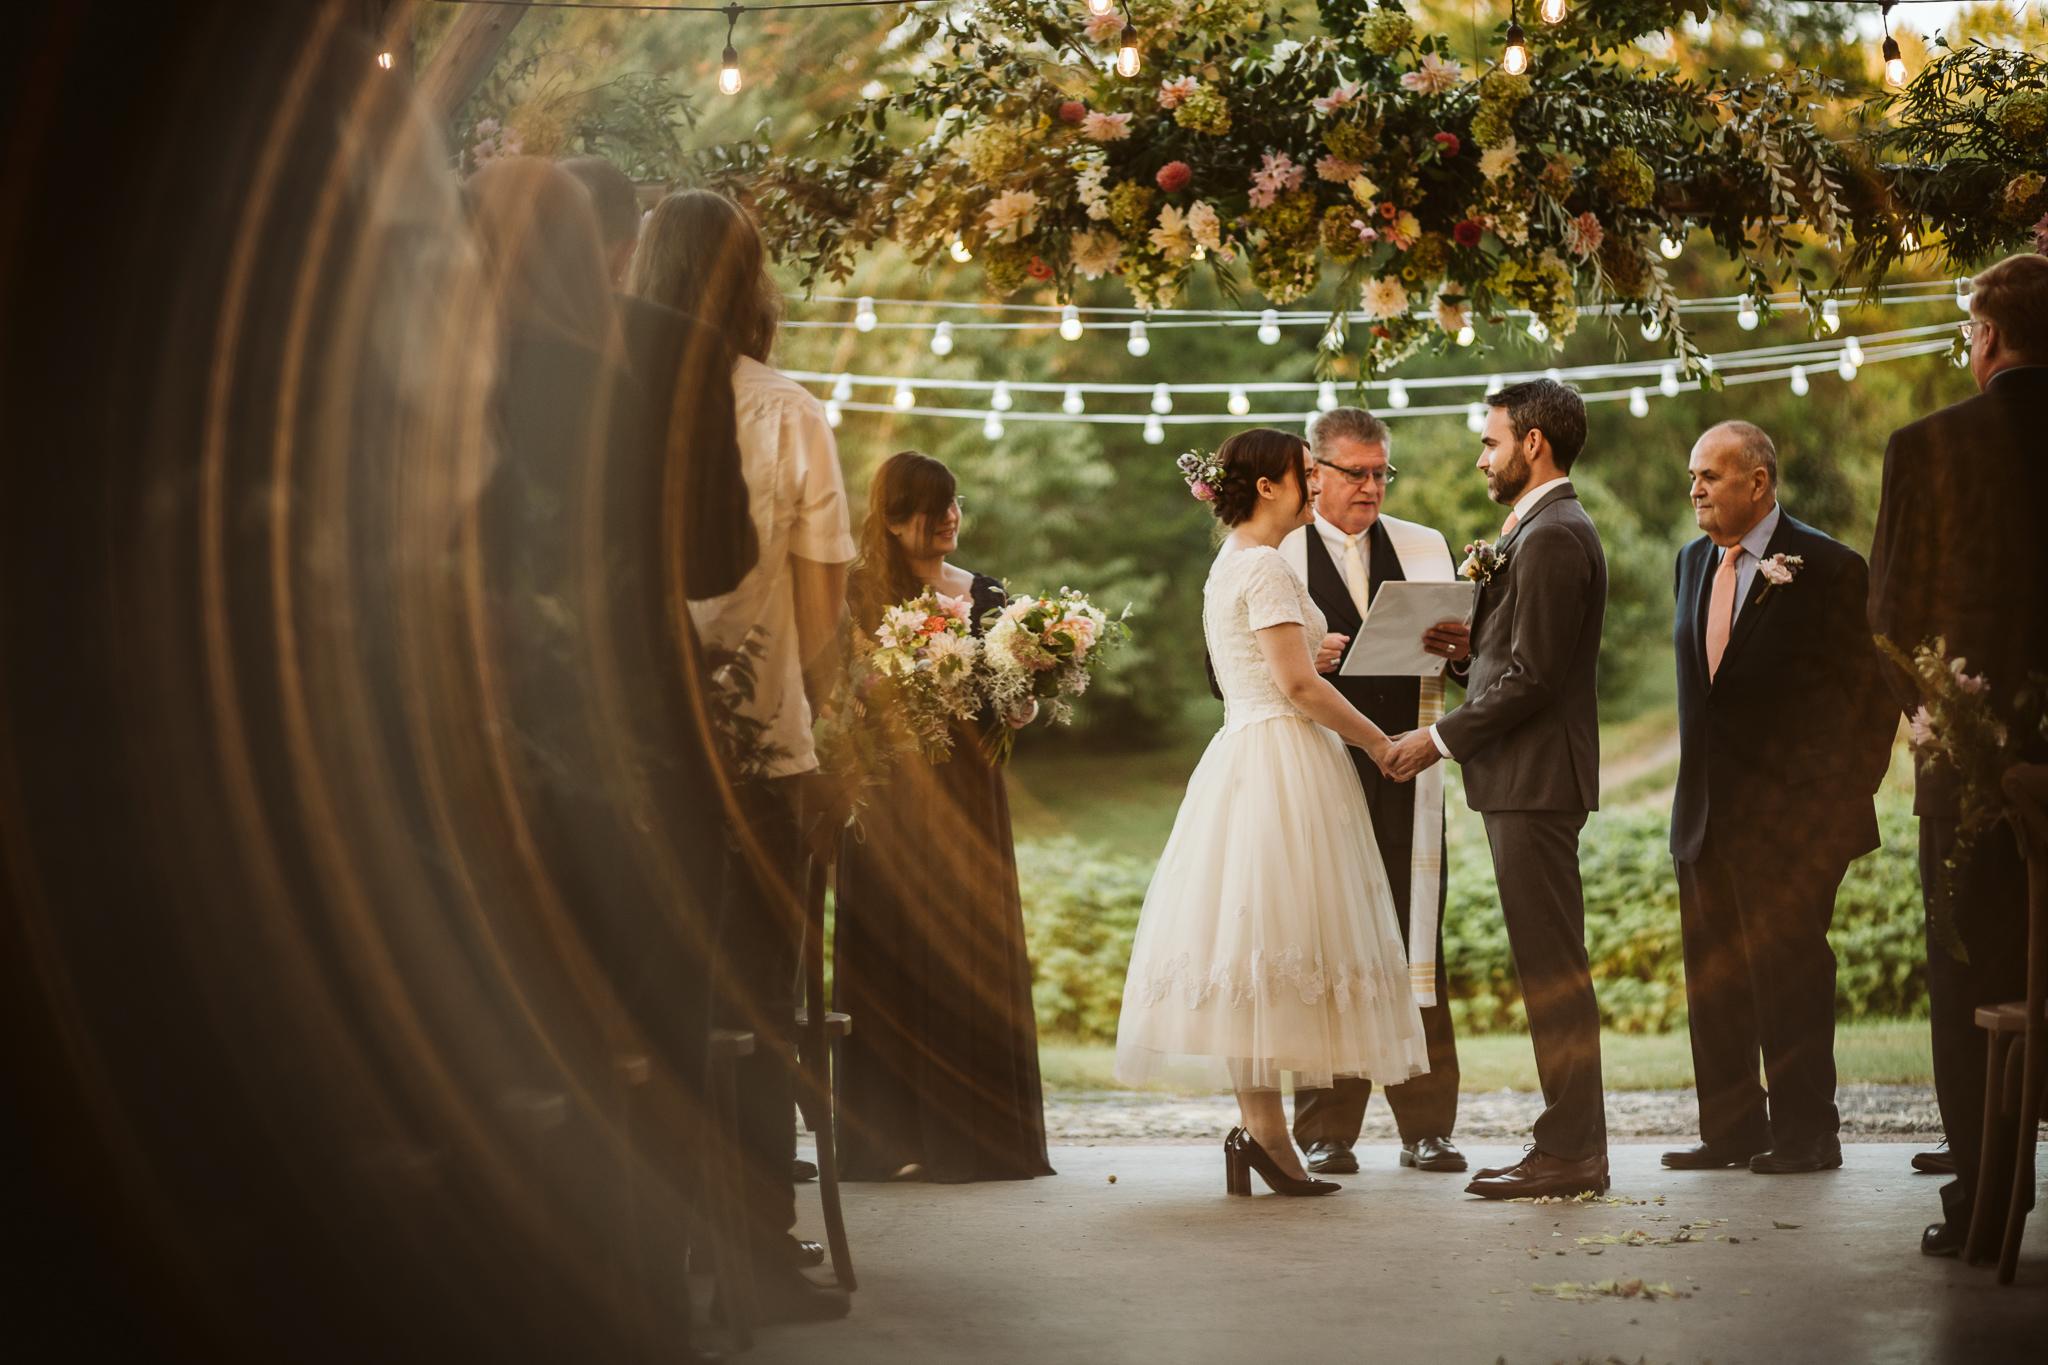 Wollam_gardens_wedding48.JPG